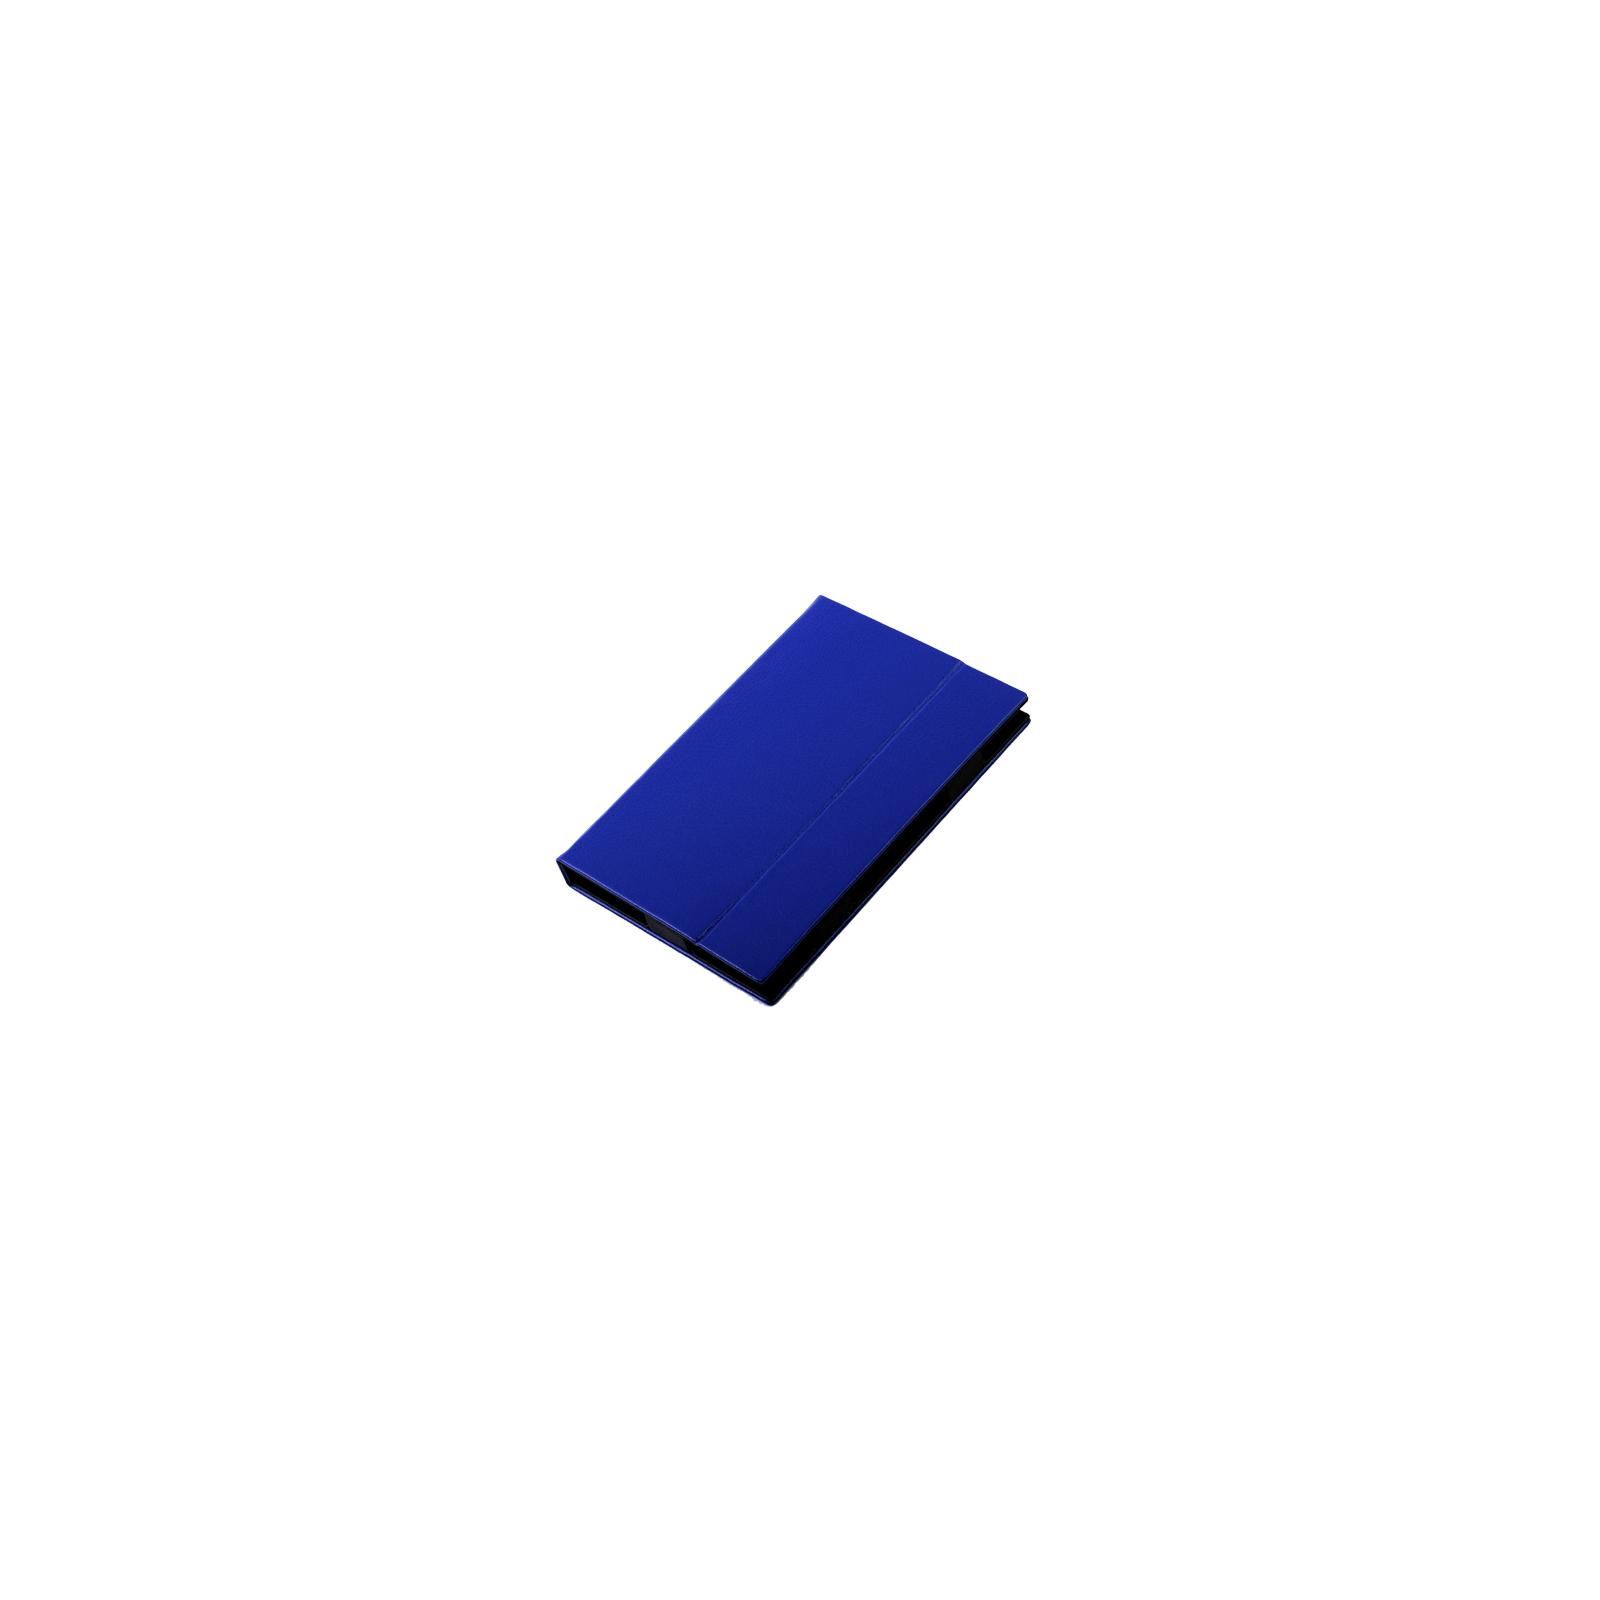 Чехол для планшета Vento 7 Desire Bright -blue